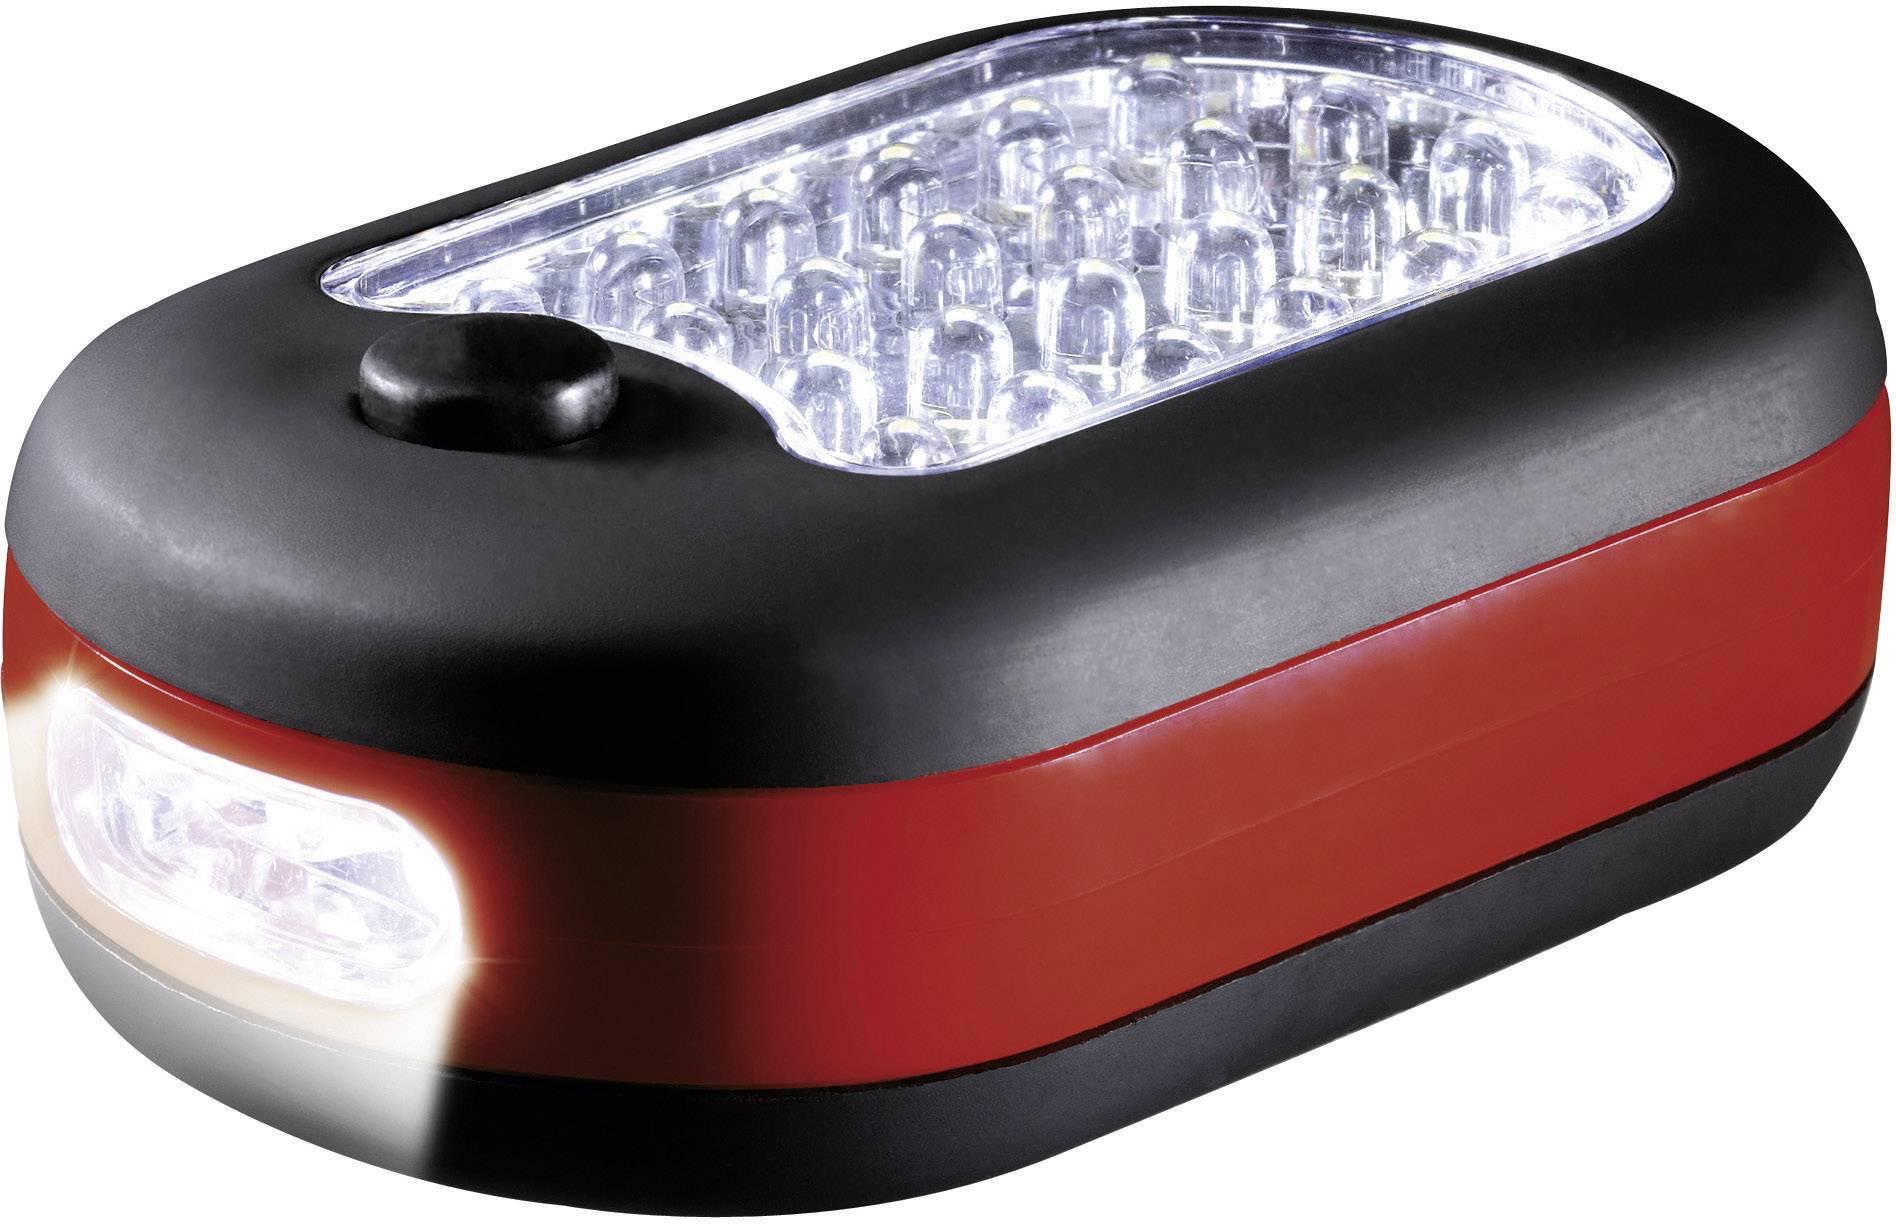 LED ploché svetlo AEG 2AEG97192 LM 324, na batérie